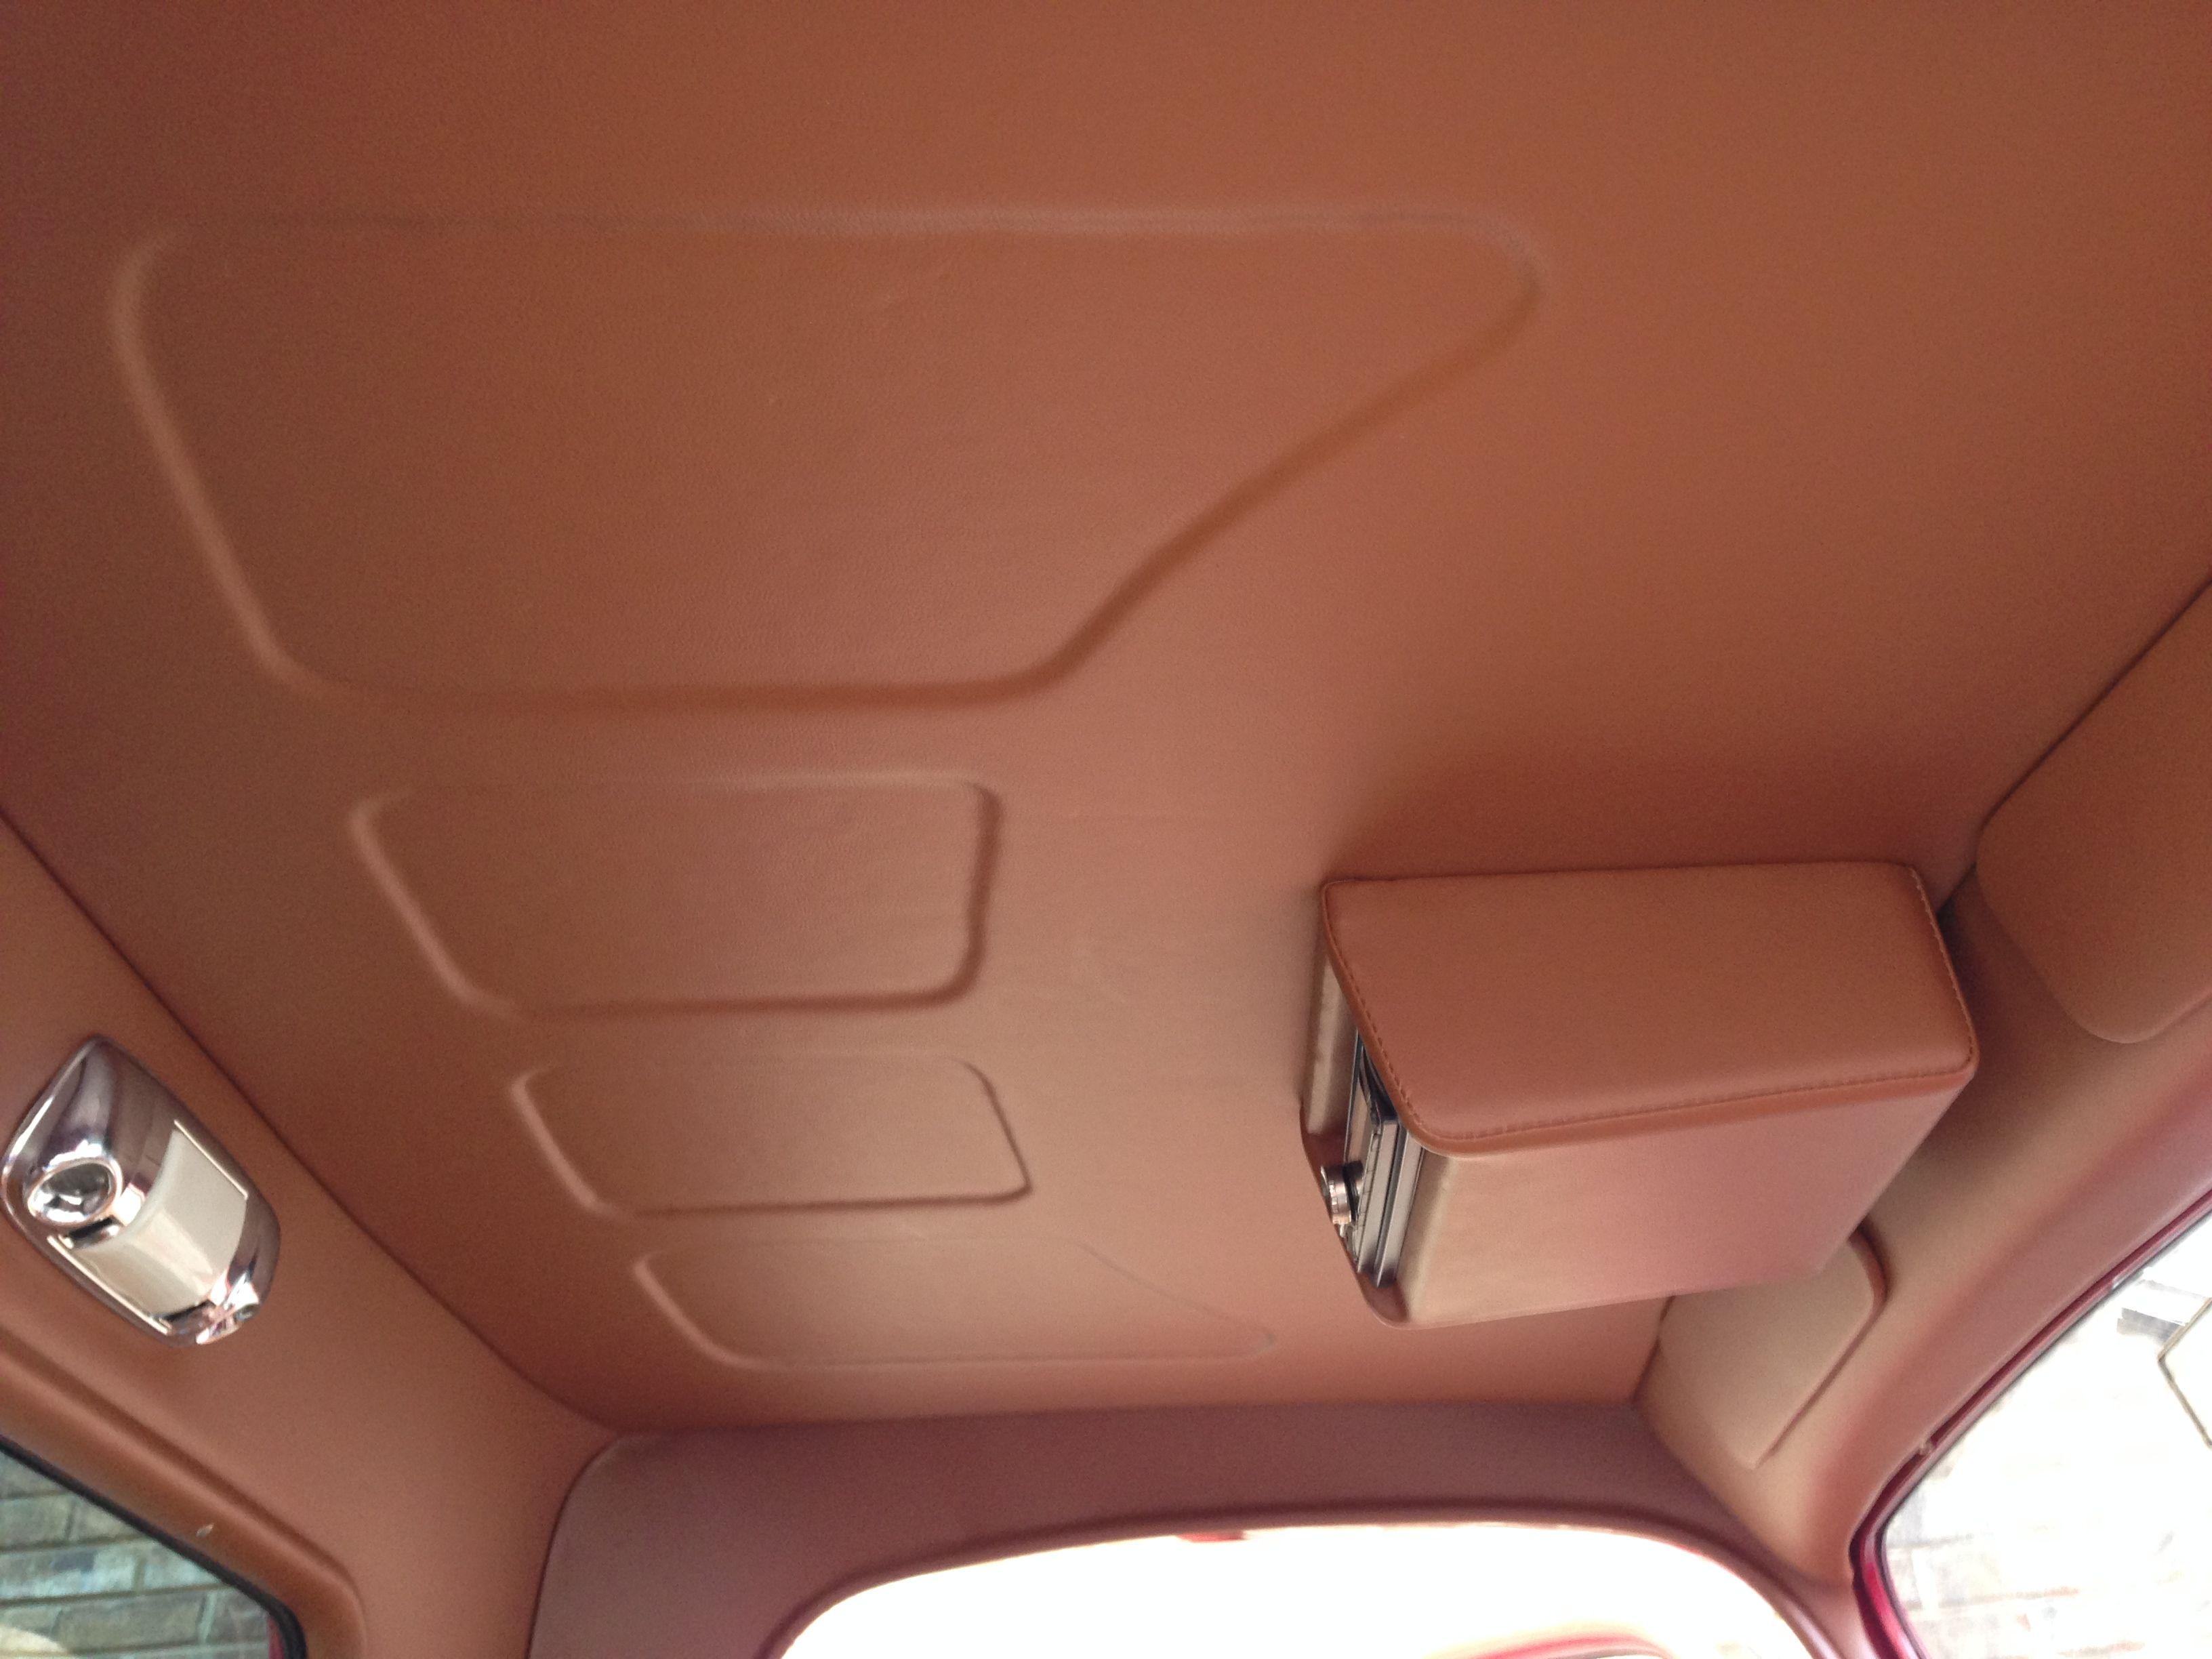 1936 Ford Pick Up Truck Custom Made Headliner In Vinyl By Romero S Auto Tops Custom Car Interior Car Interior Upholstery Car Interior Accessories